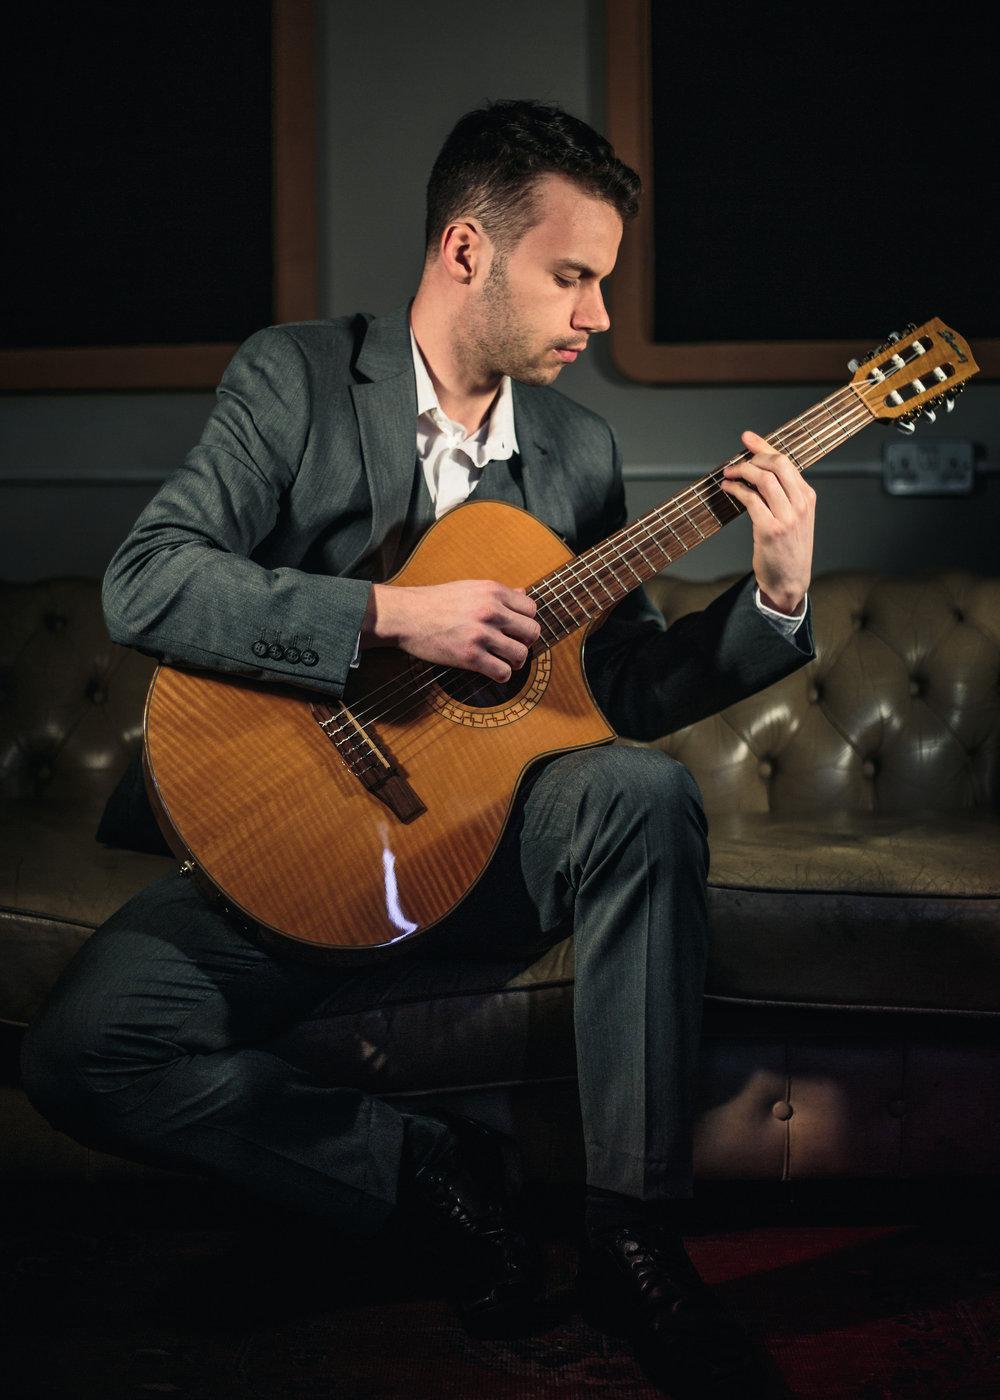 J. Charles Guitar